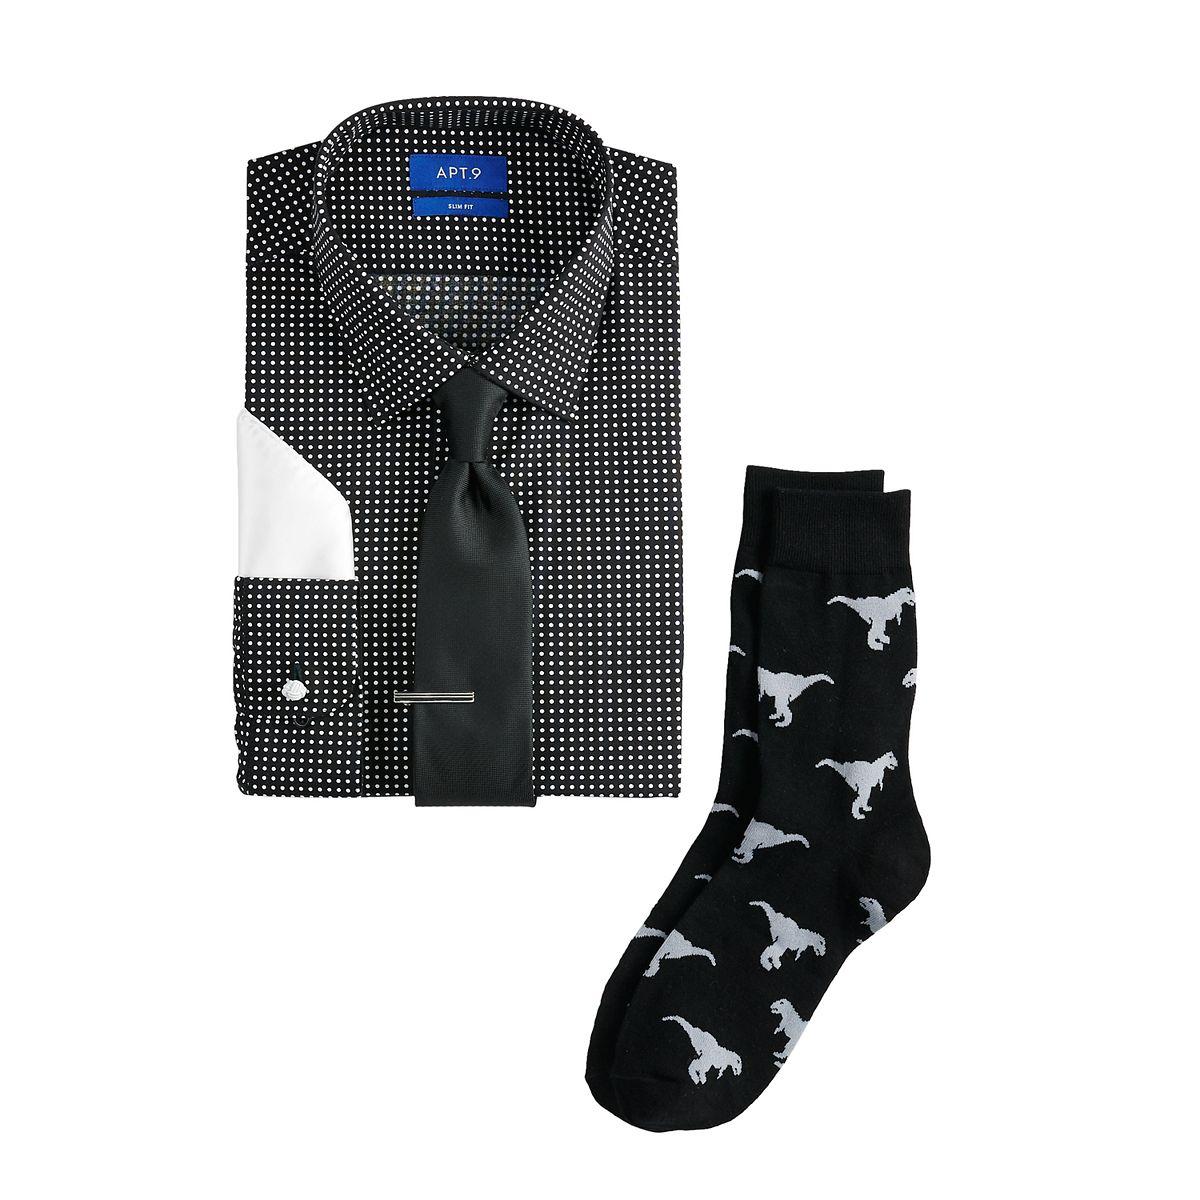 6-Piece Men's Apt. 9 Slim-Fitt Dress Shirt Set $7.20, Sonoma Goods For Life Men's McCreery Ankle Boots $8.39, Geoffrey Beene Slim-Fit Dress Shirt $4.80, More + FS on $75